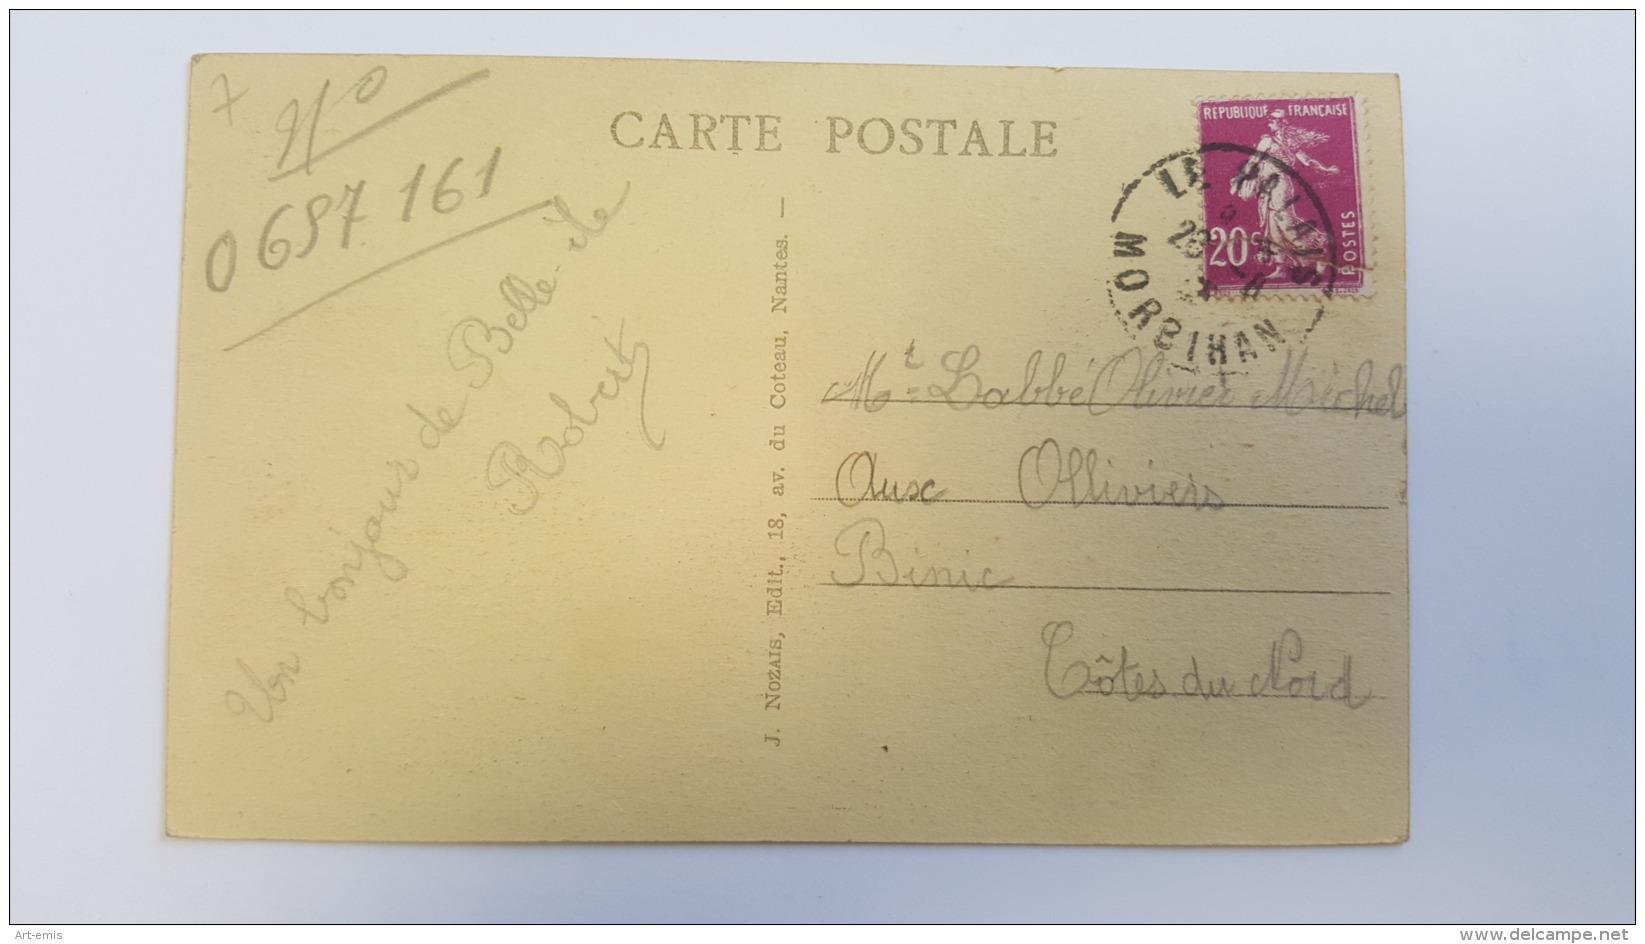 BELLE ILE EN MER 56 LE VALLON DE BORTIFAOUENNE BORCASTEL MORBIHAN CPA Animee Postcard - Belle Ile En Mer